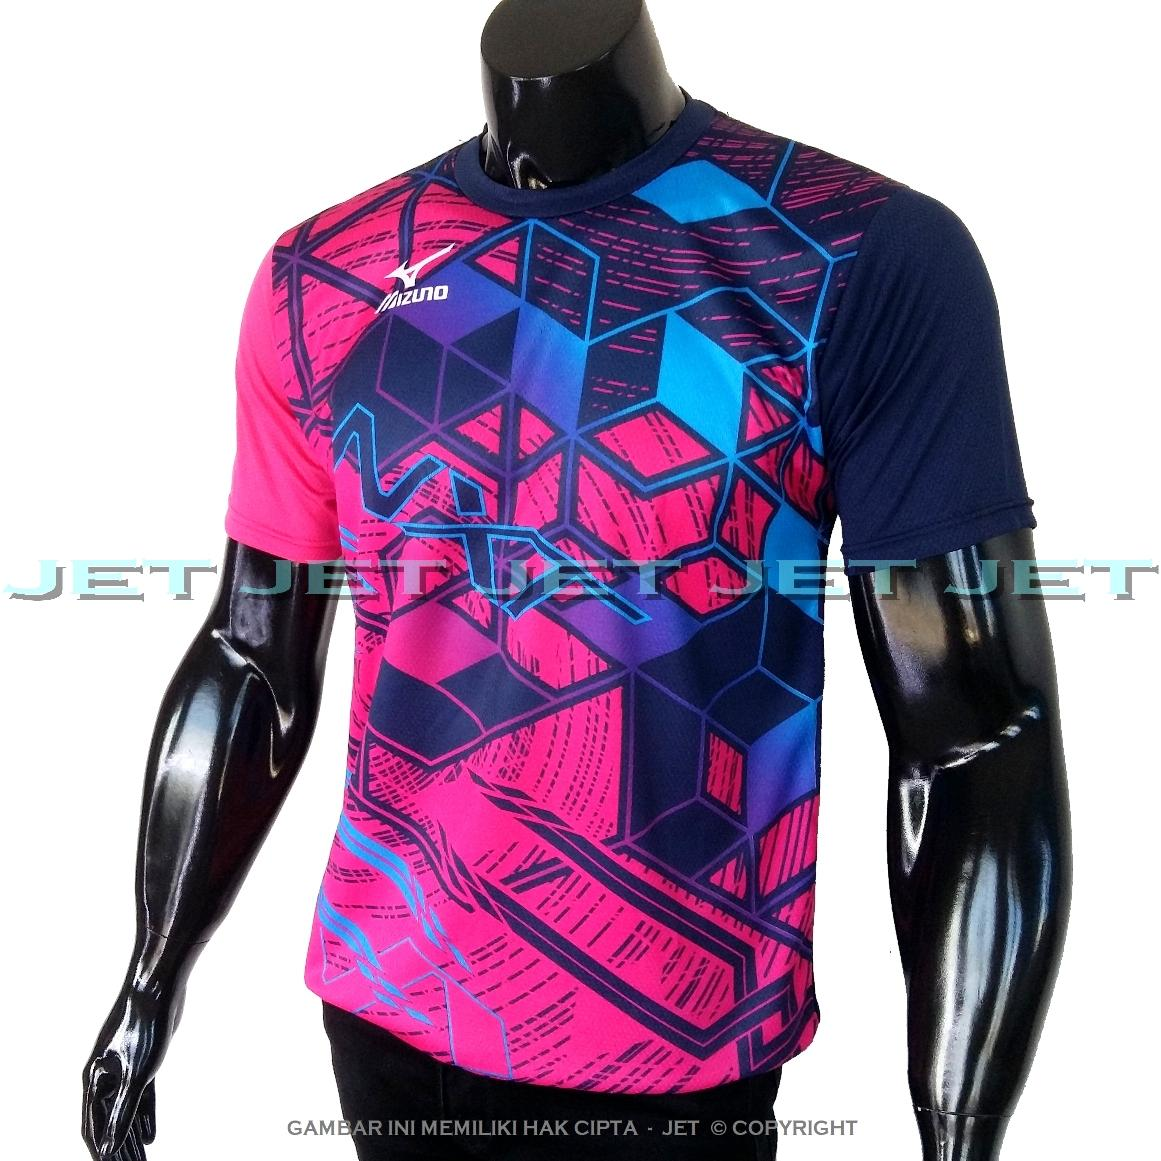 Baju Celana Olahraga Kaos Setelan Badminton Jersey Bulutangkis Navy. Source · JeT Sports - Kaos Olahraga M L XL - Dri Fit Sport Jersey - Replica - Segala